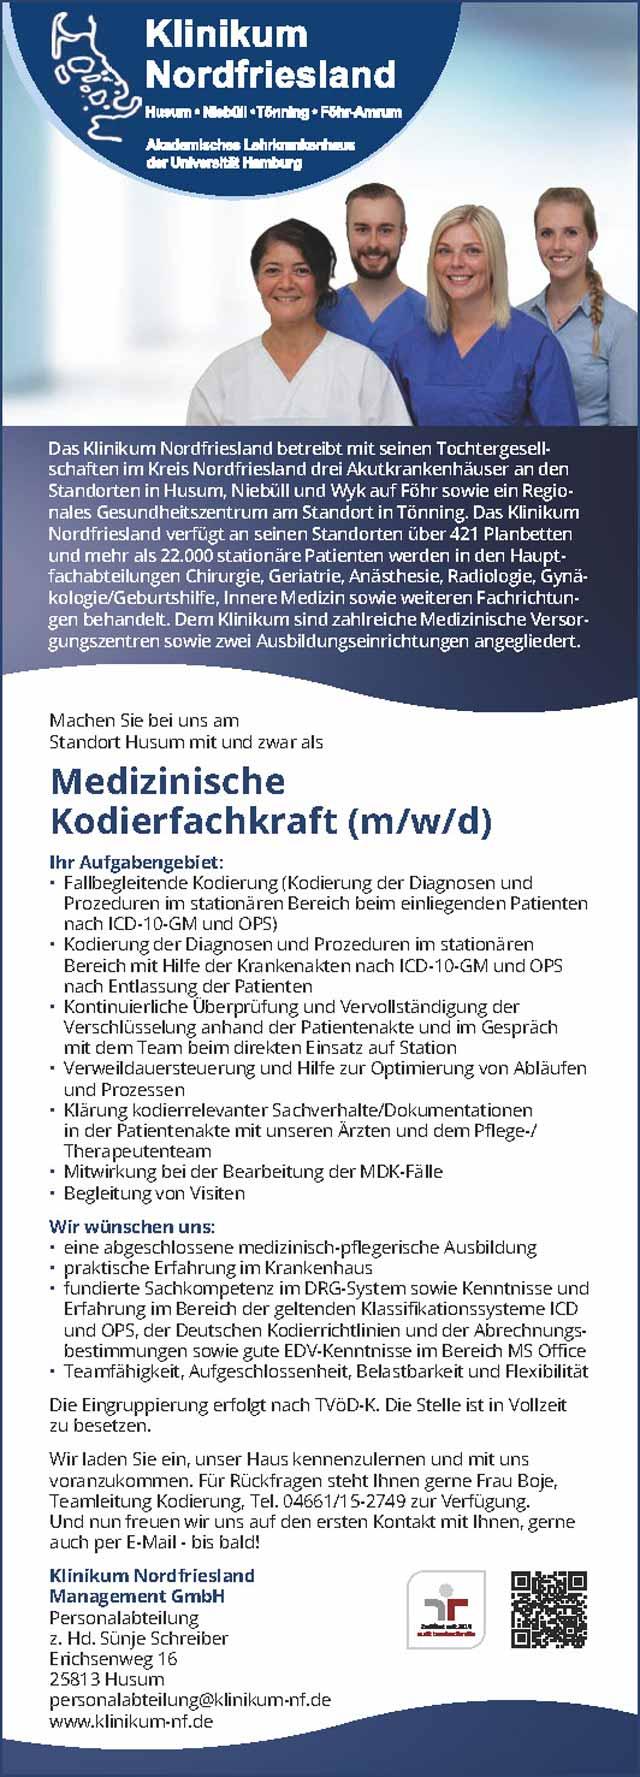 Klinikum Nordfriesland gGmbH, Husum: Medizinische Kodierfachkraft (m/w/d)